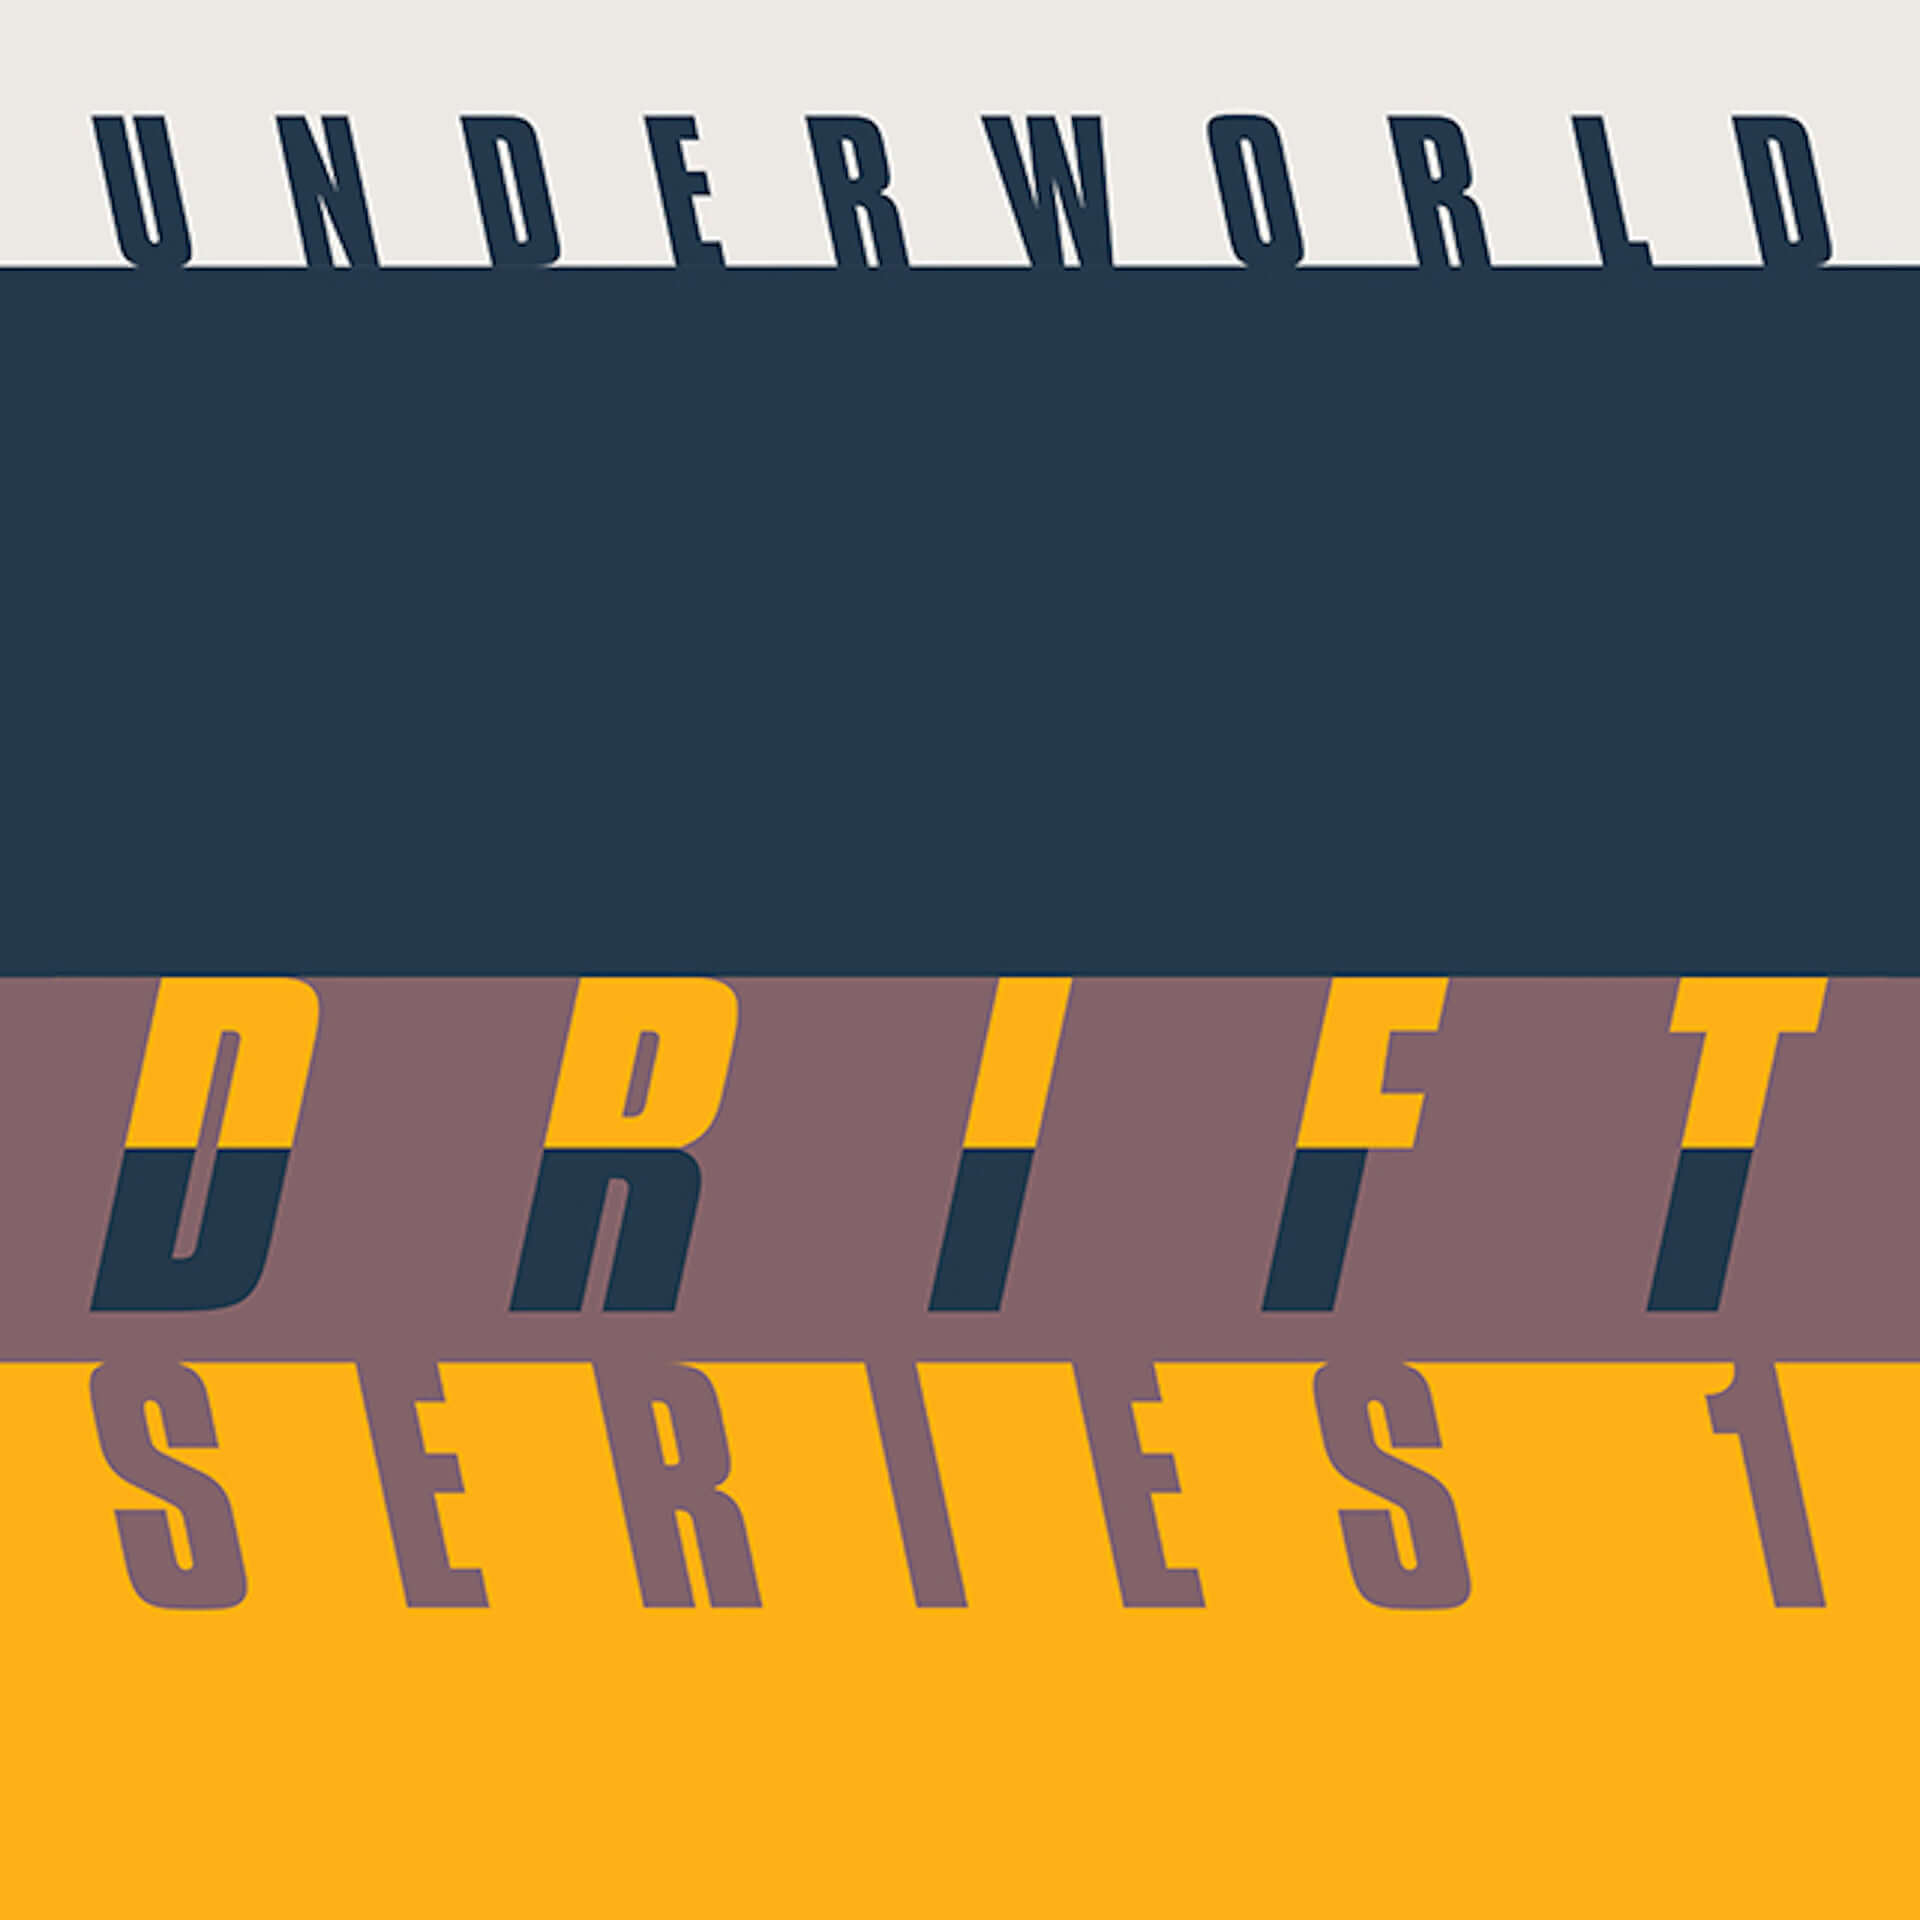 Underworldの伝説のステージ<SUMMER SONIC 2016>の記録映像が明日配信!当時のライブレポートが公開&公式Tシャツが復刻決定 music200626_underworld_3-1920x1920